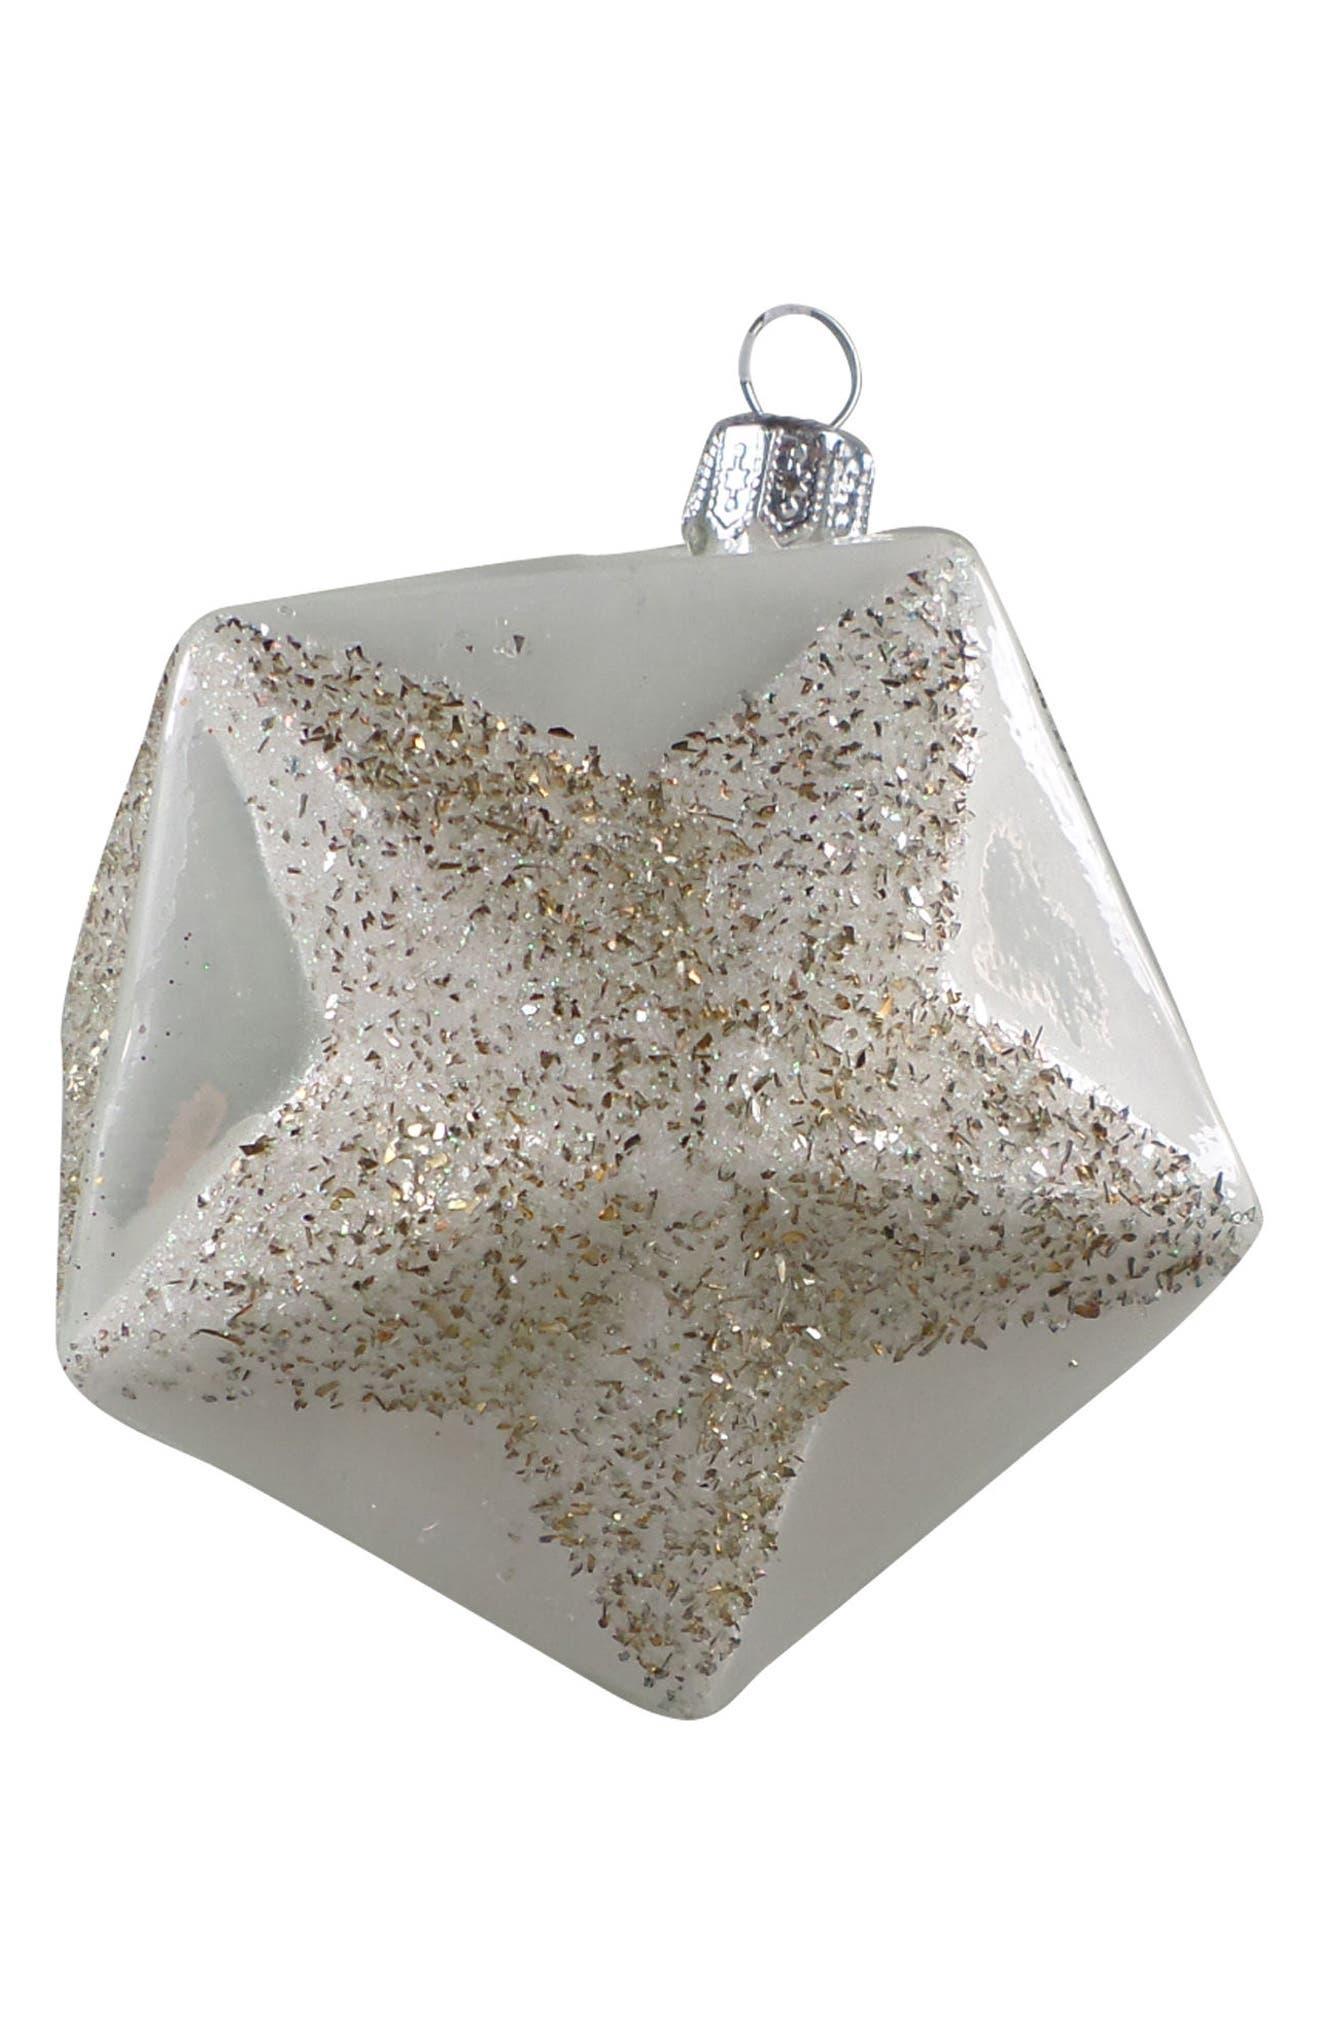 Nordstrom at Home Handblown Glass Celestial Star Ornament